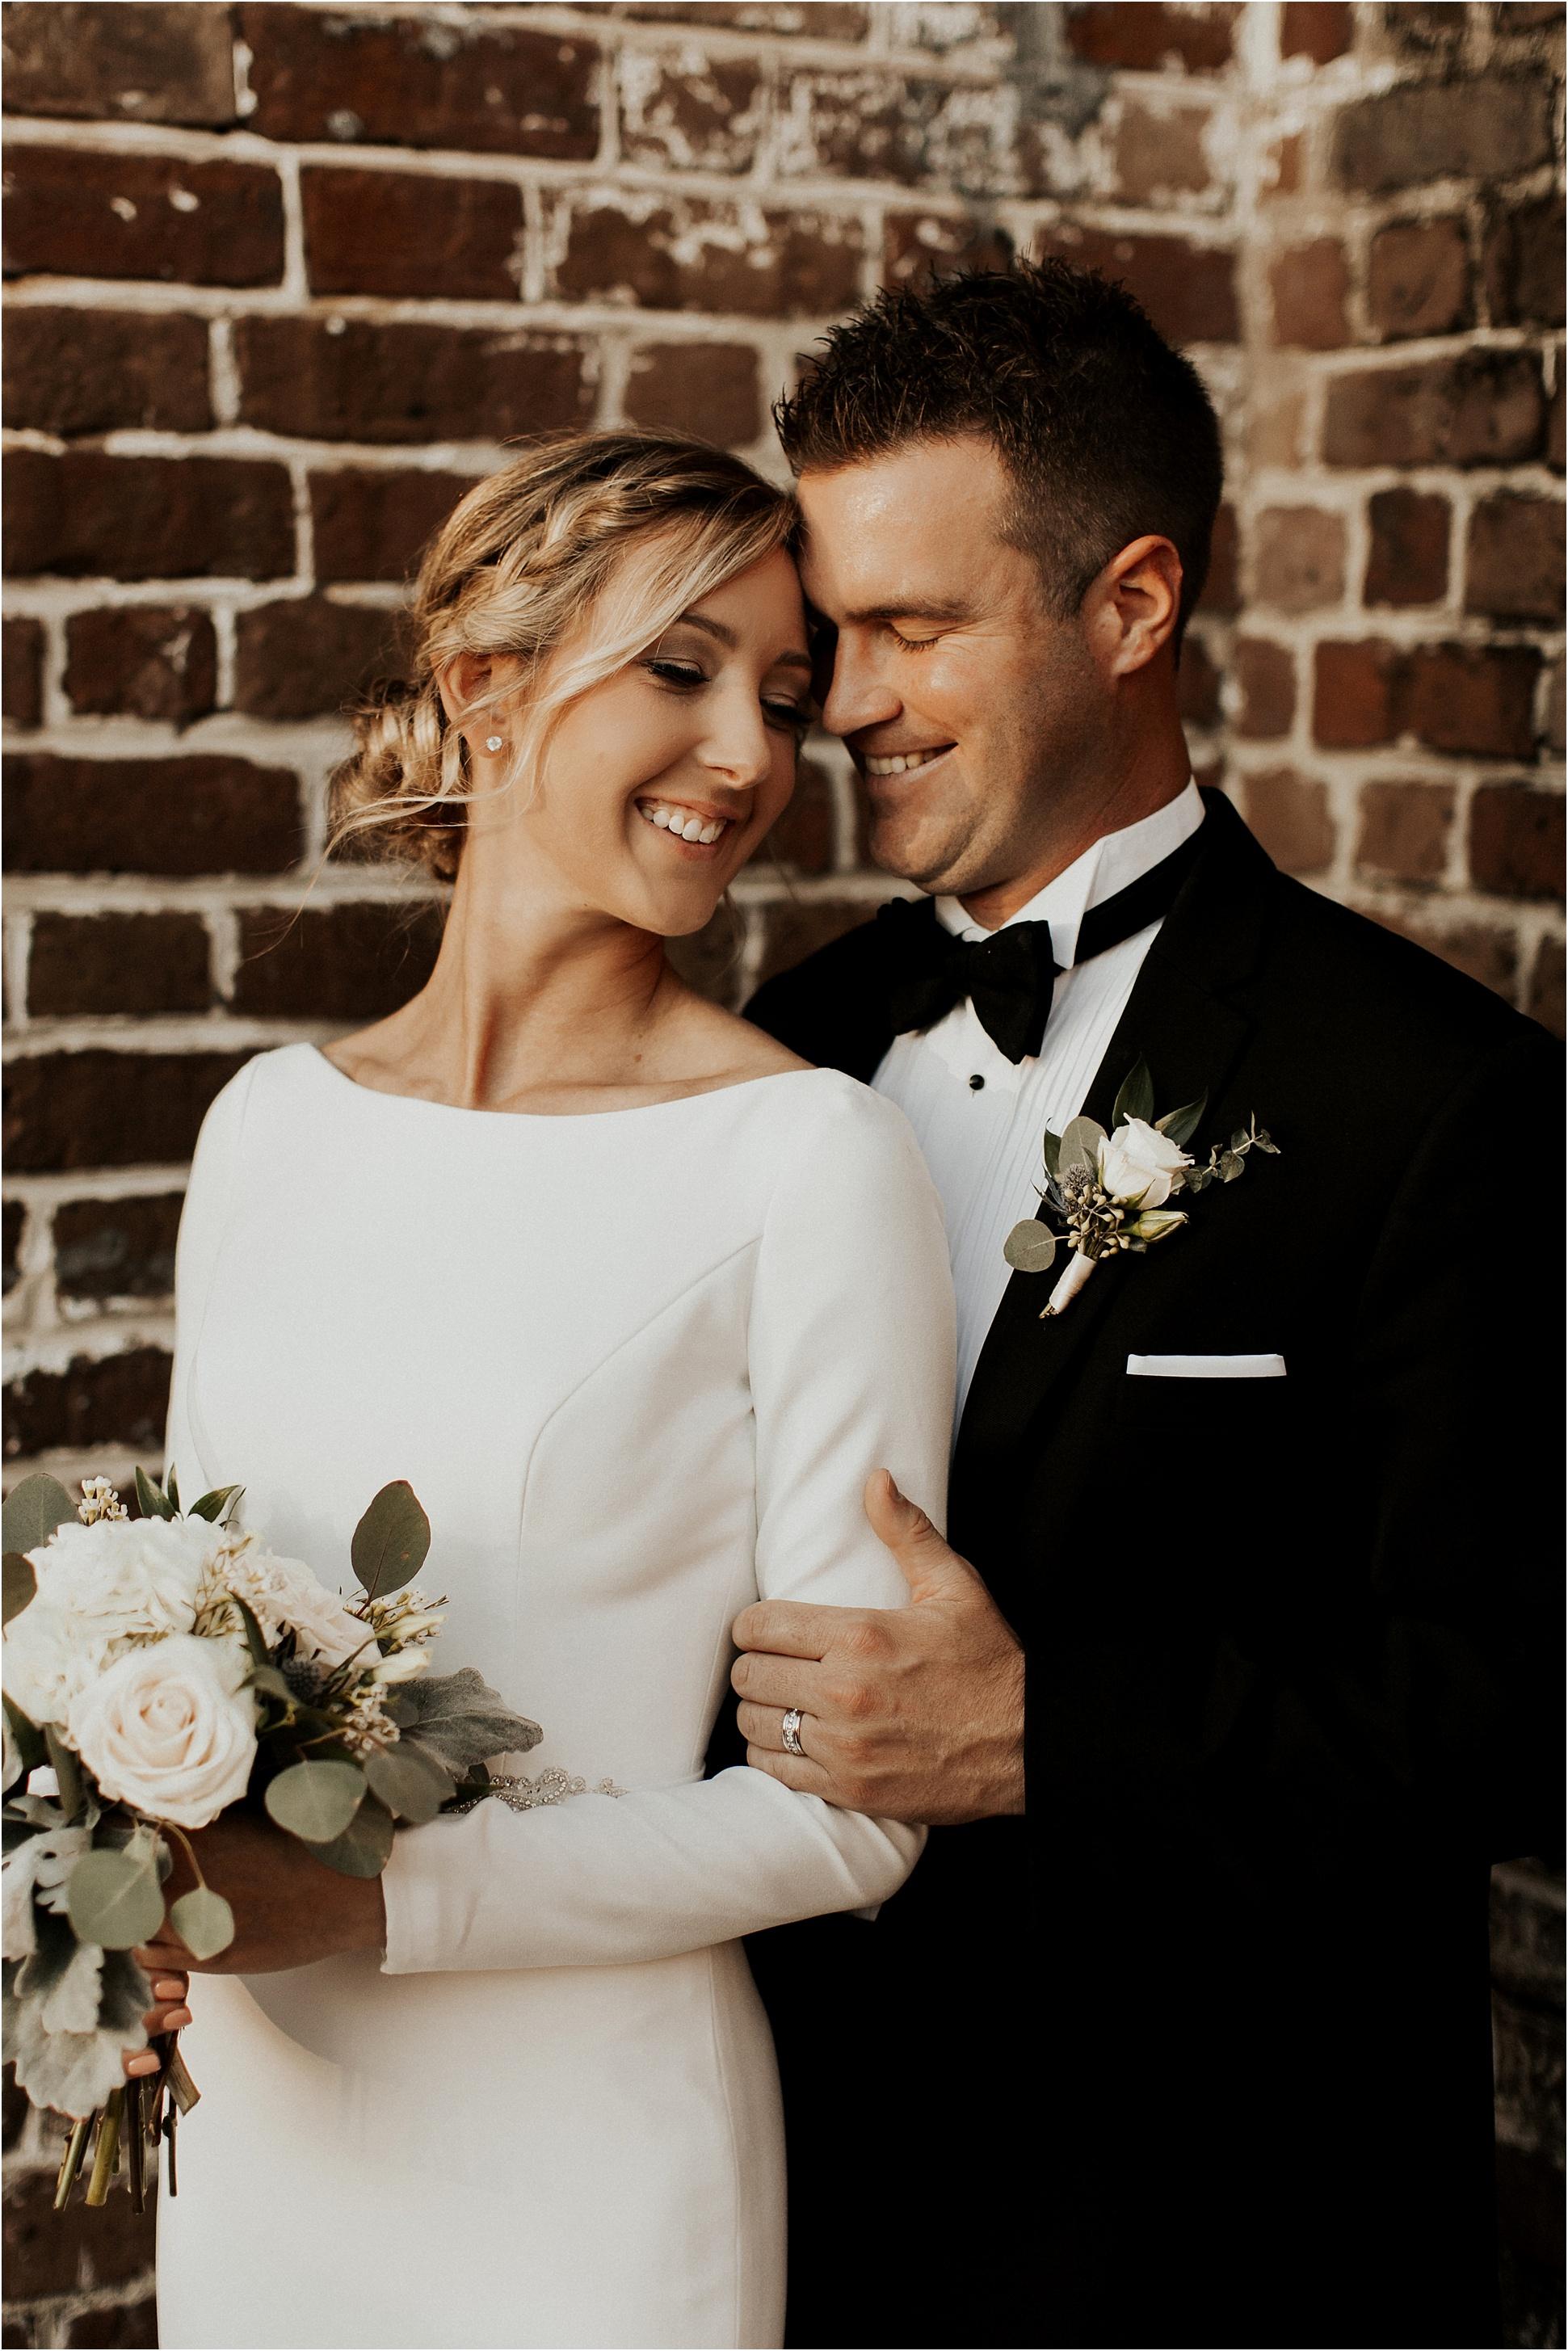 upstairs_midtown_intimate_charleston_wedding066.JPG